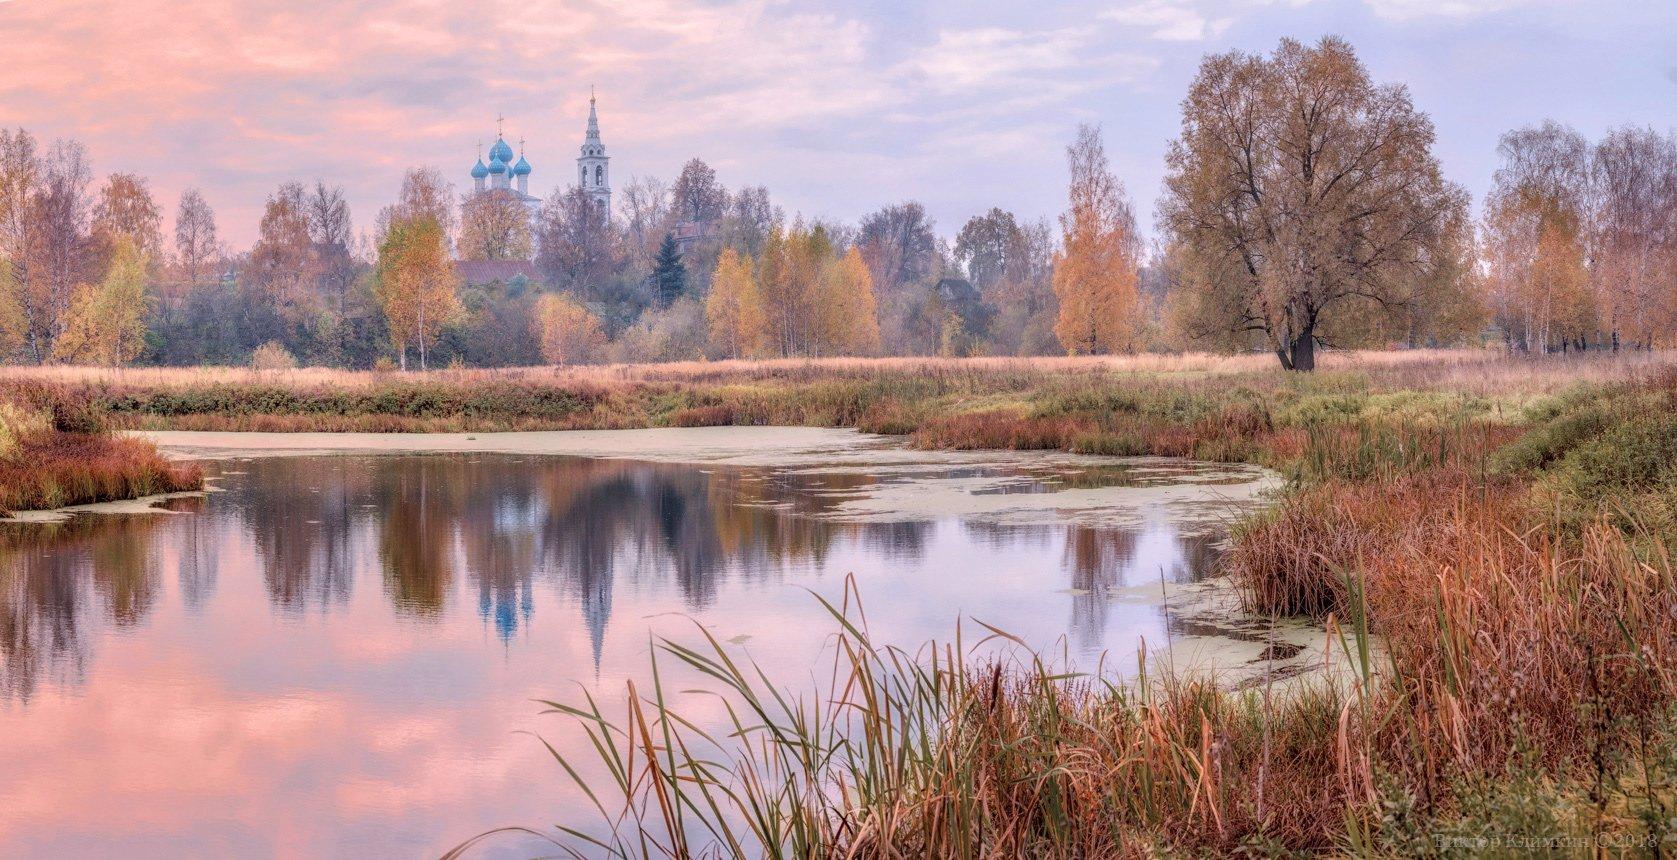 осень, пруд, храм, россия, Виктор Климкин